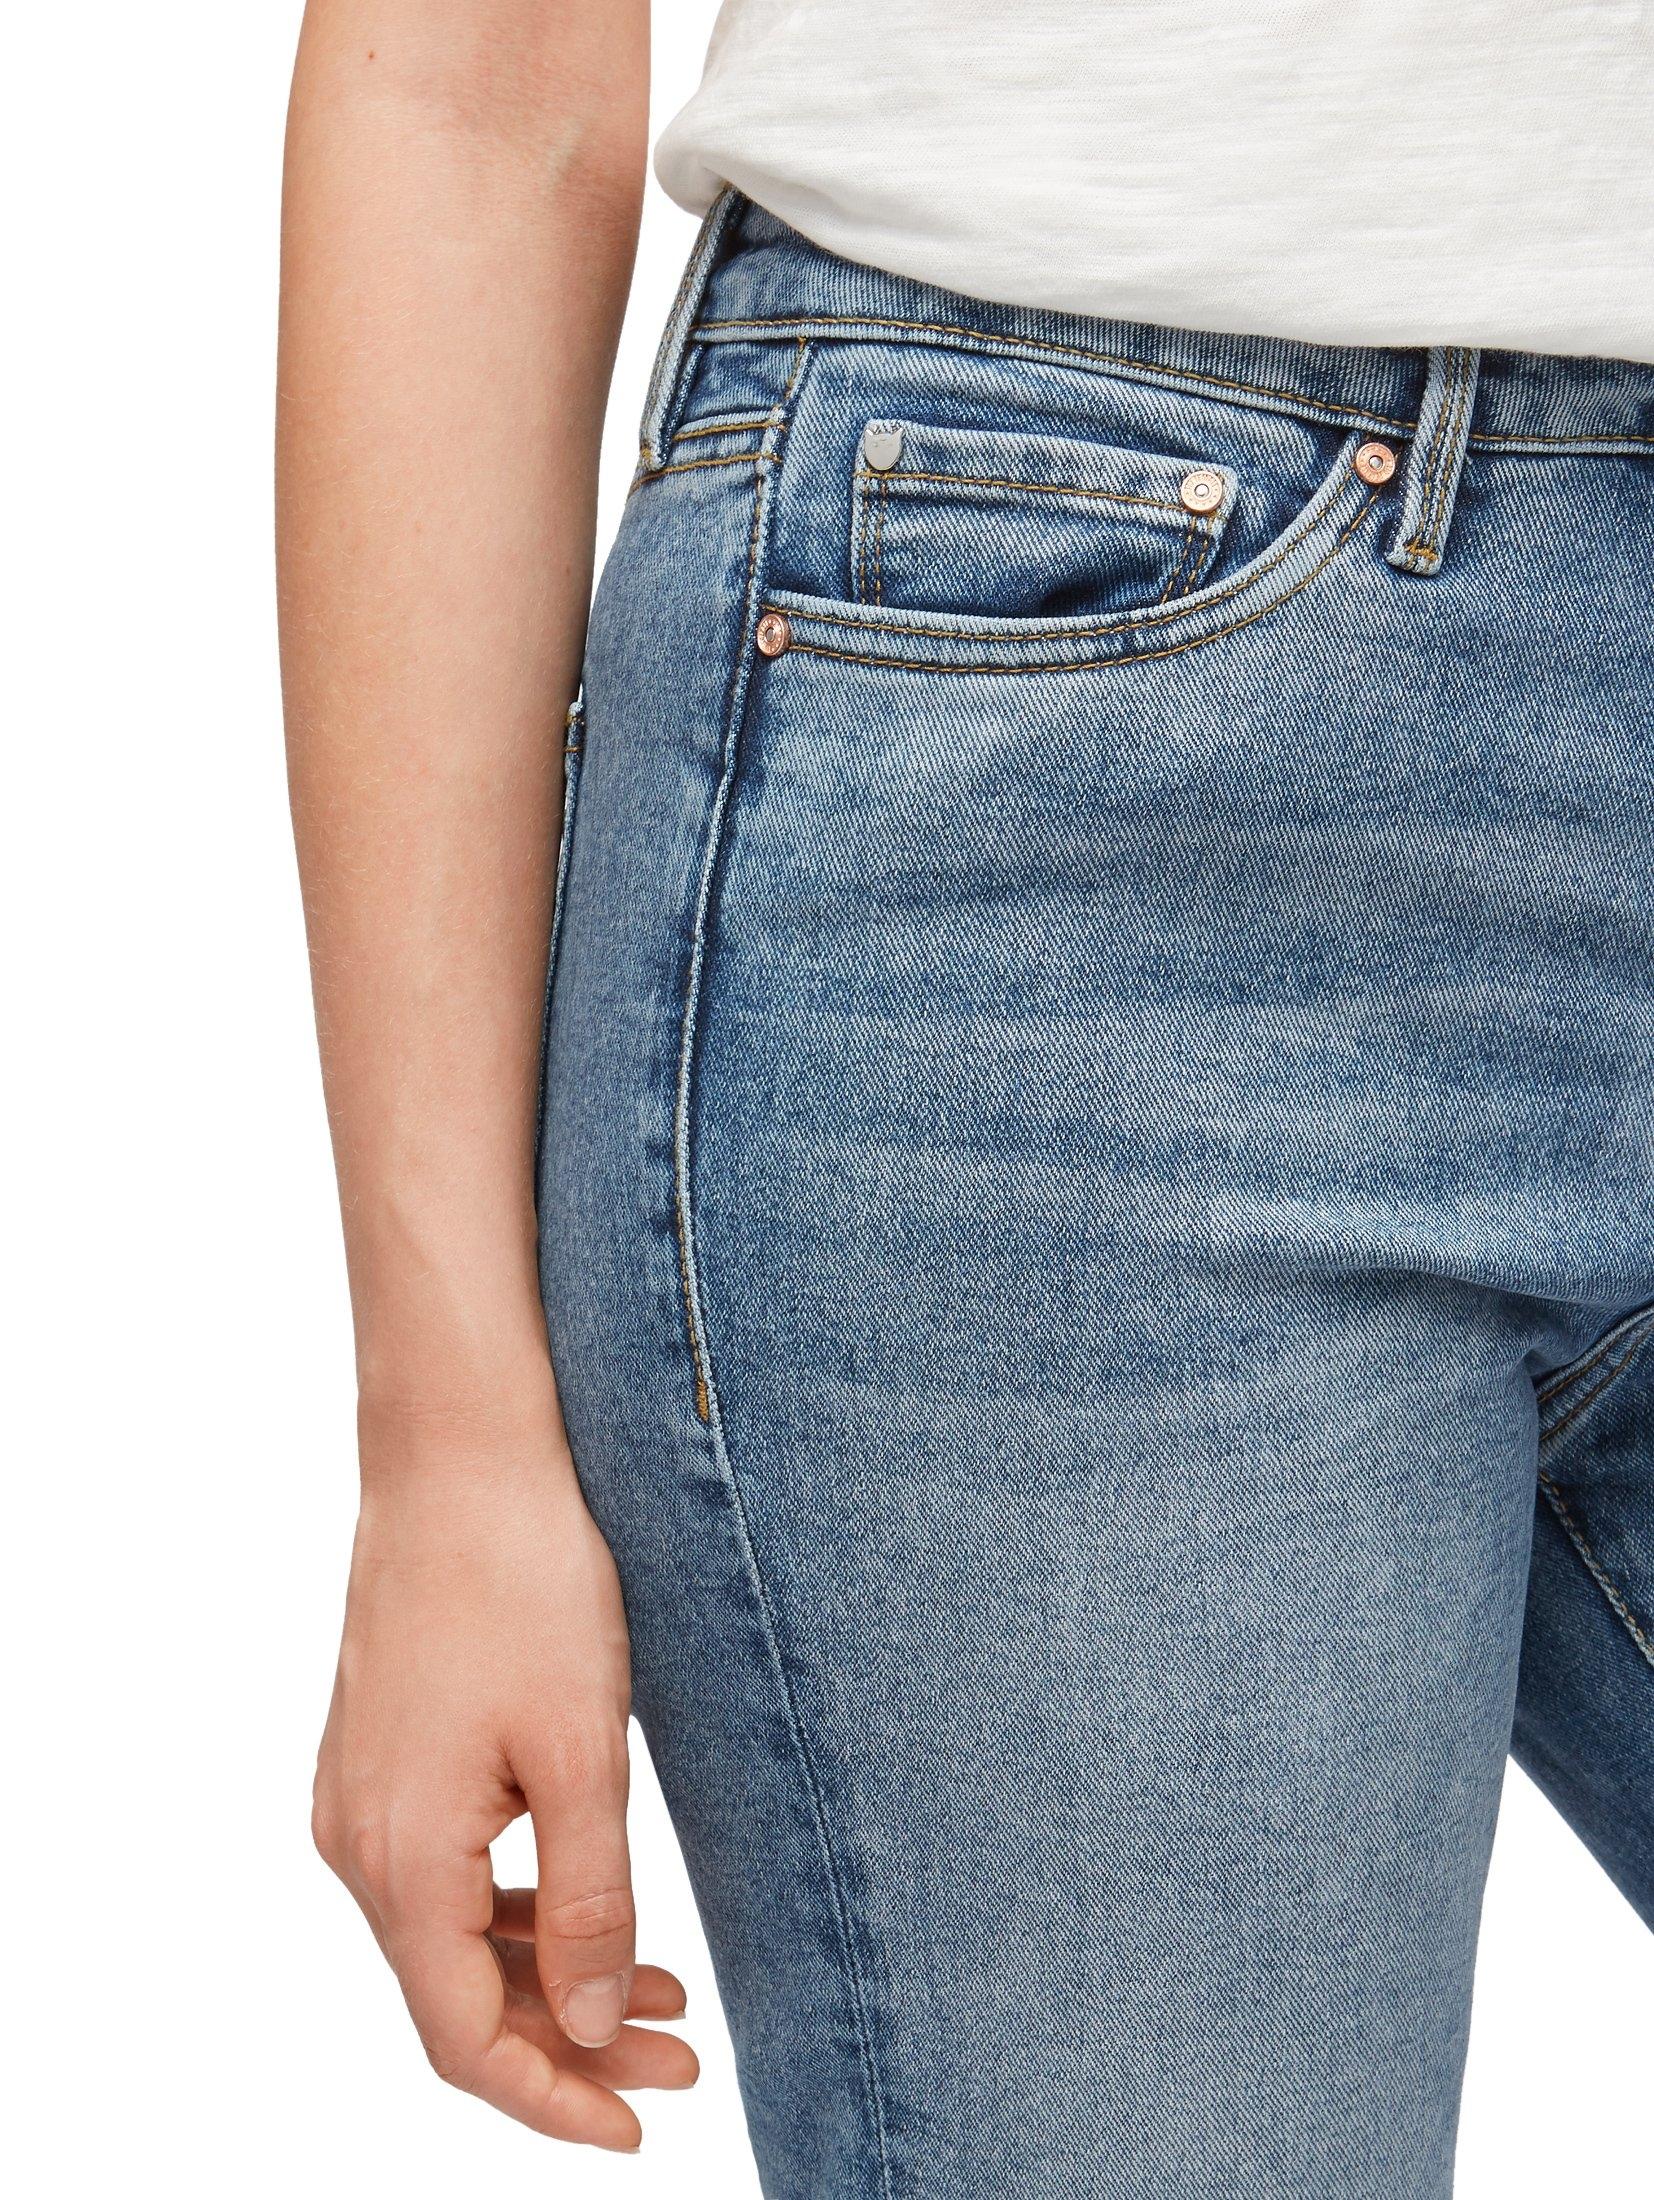 Tom Verkrijgbaar Ankle Jeansemma Jeans Online Tailor Denim mN0wv8n